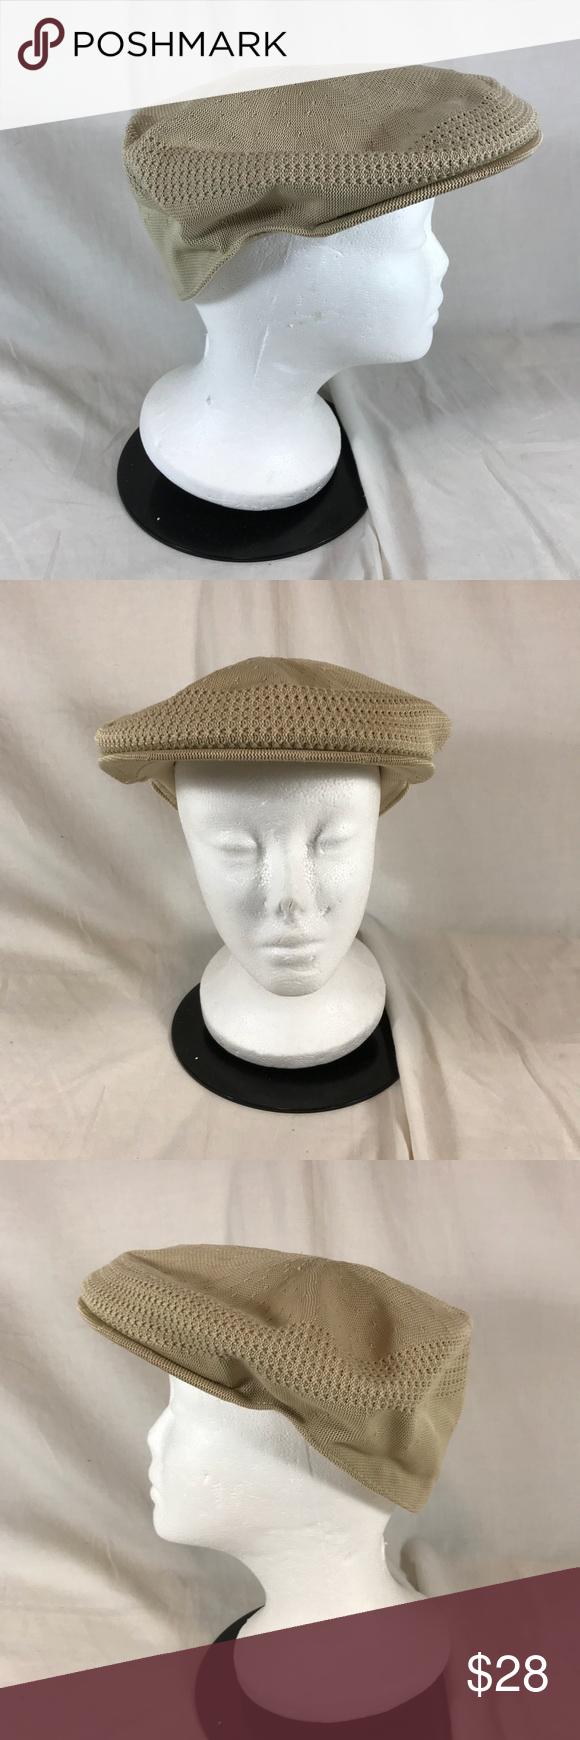 0e59592b72a Kangol Tropic 504 Ventair Hat Flat Cap Beige XL Kangol Tropic 504 Ventair  Hat Cap